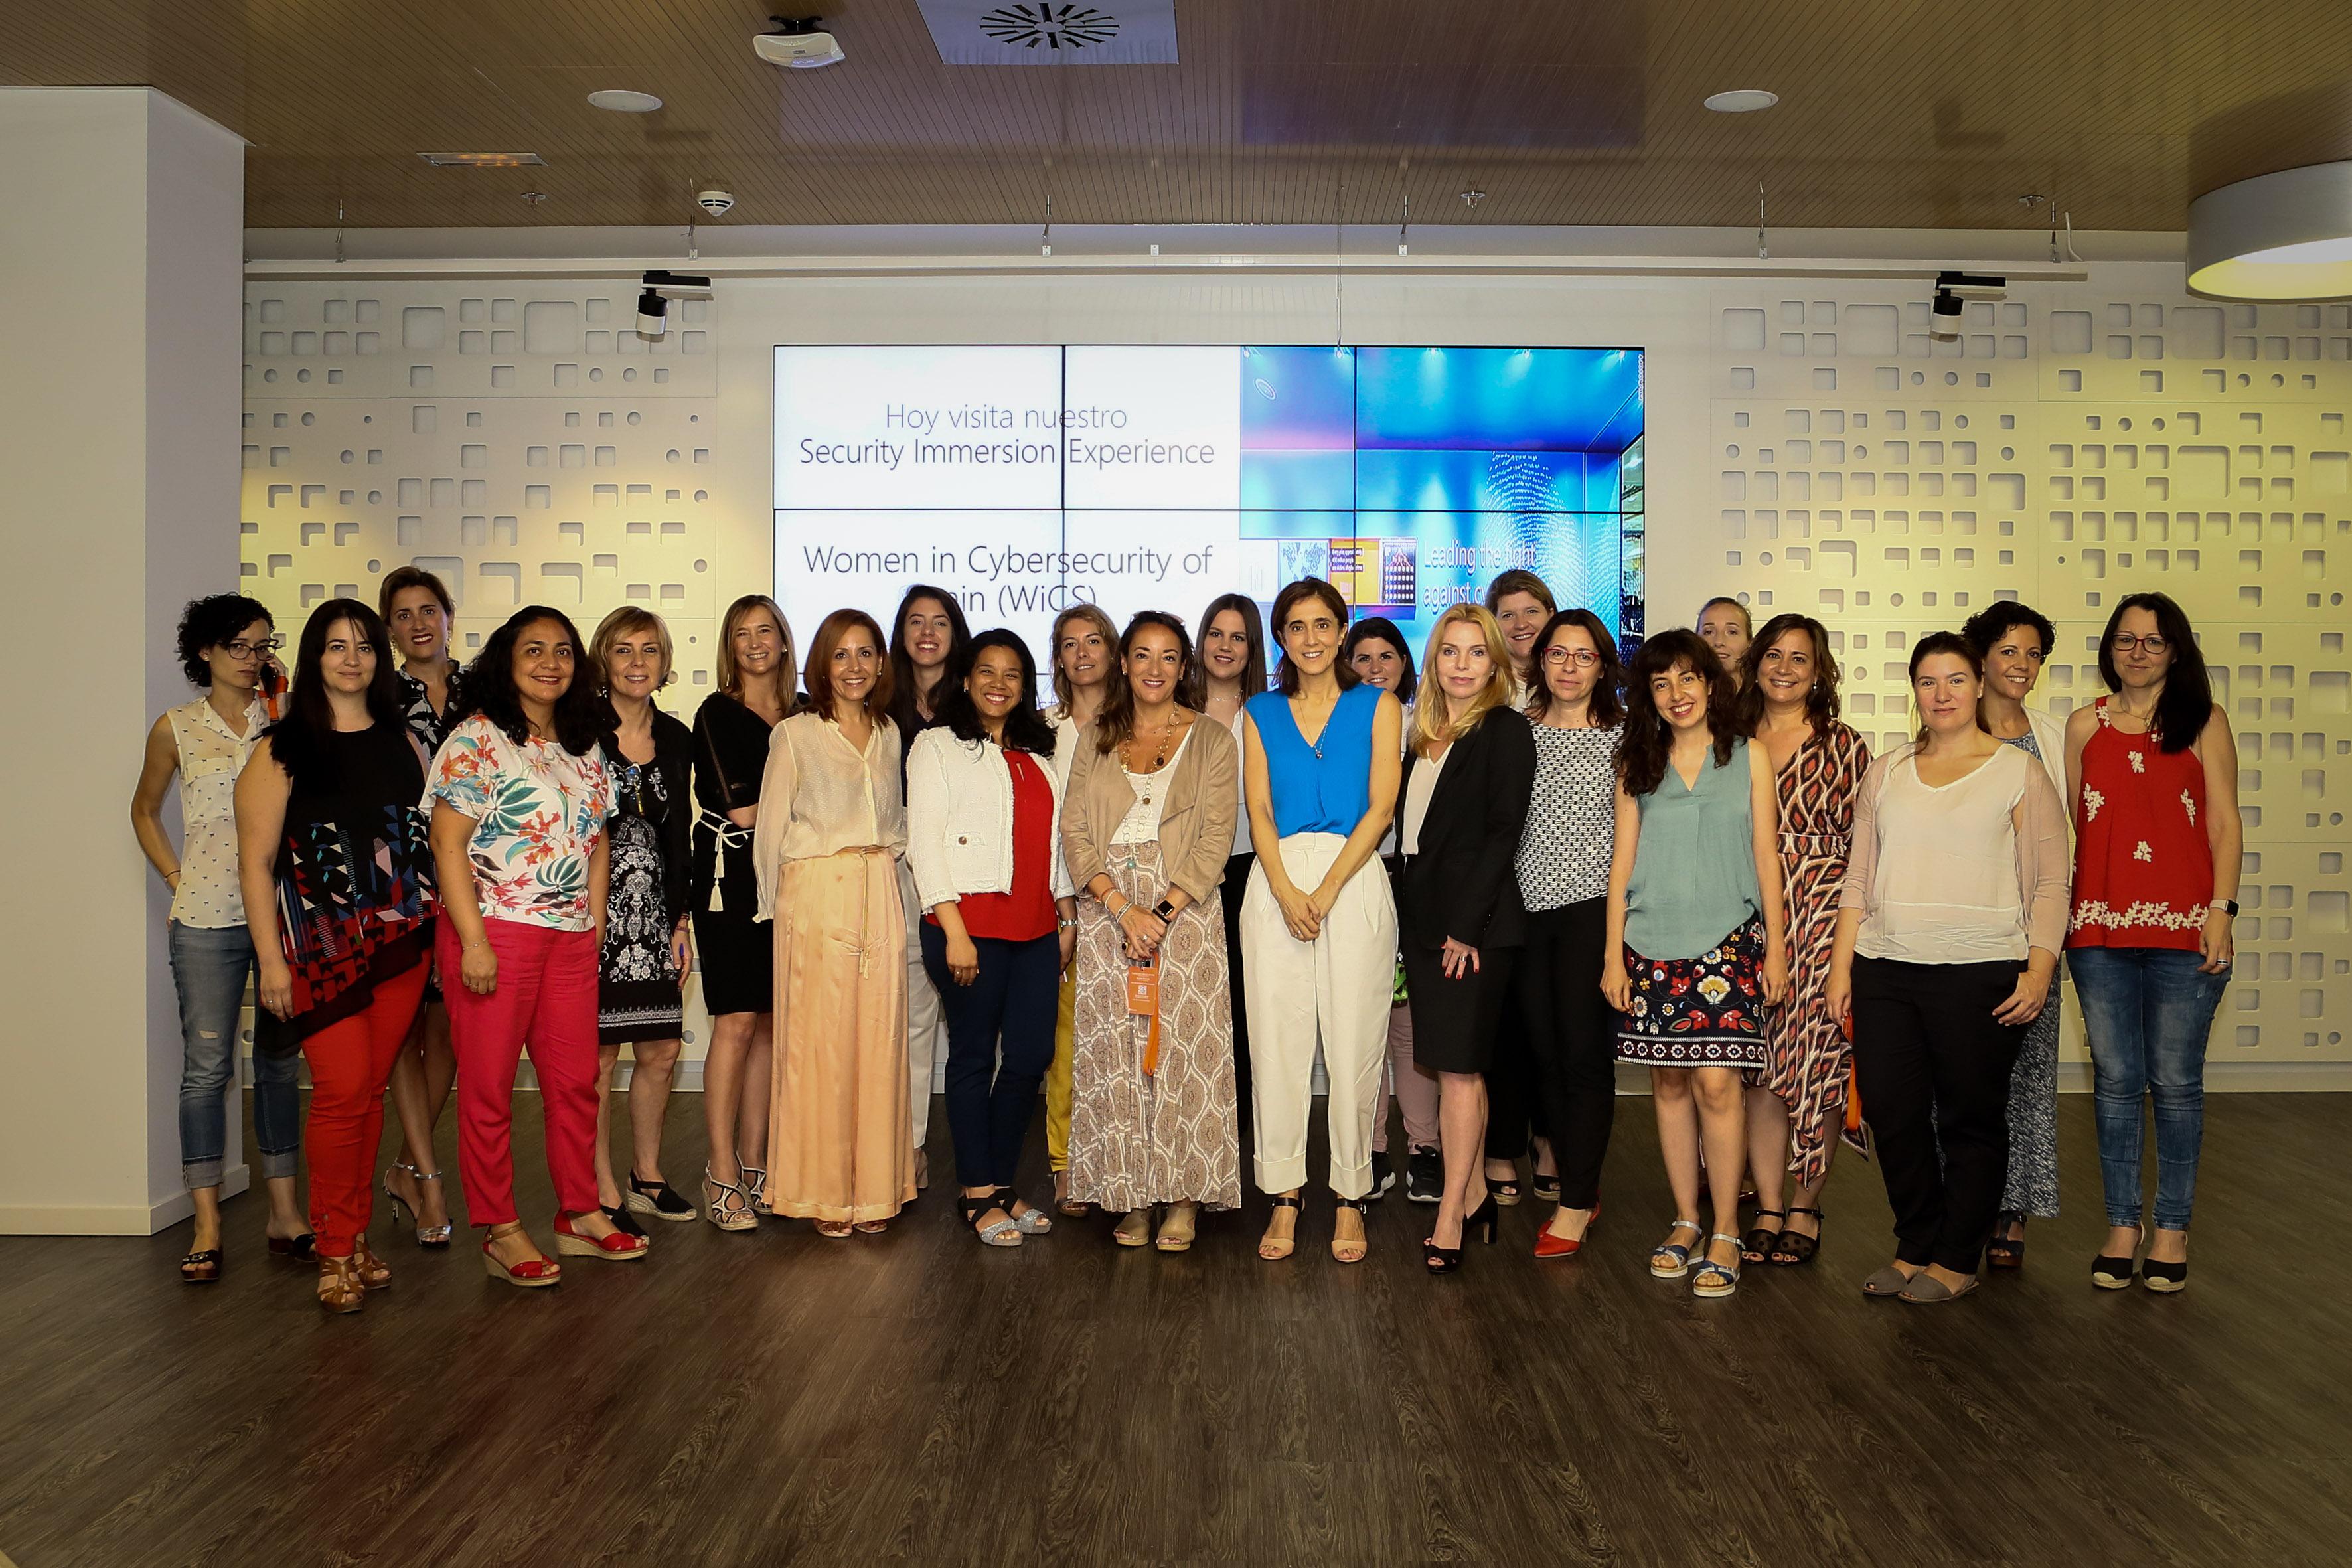 Women in Cibersecurity of Spain (3) - Foto de familia